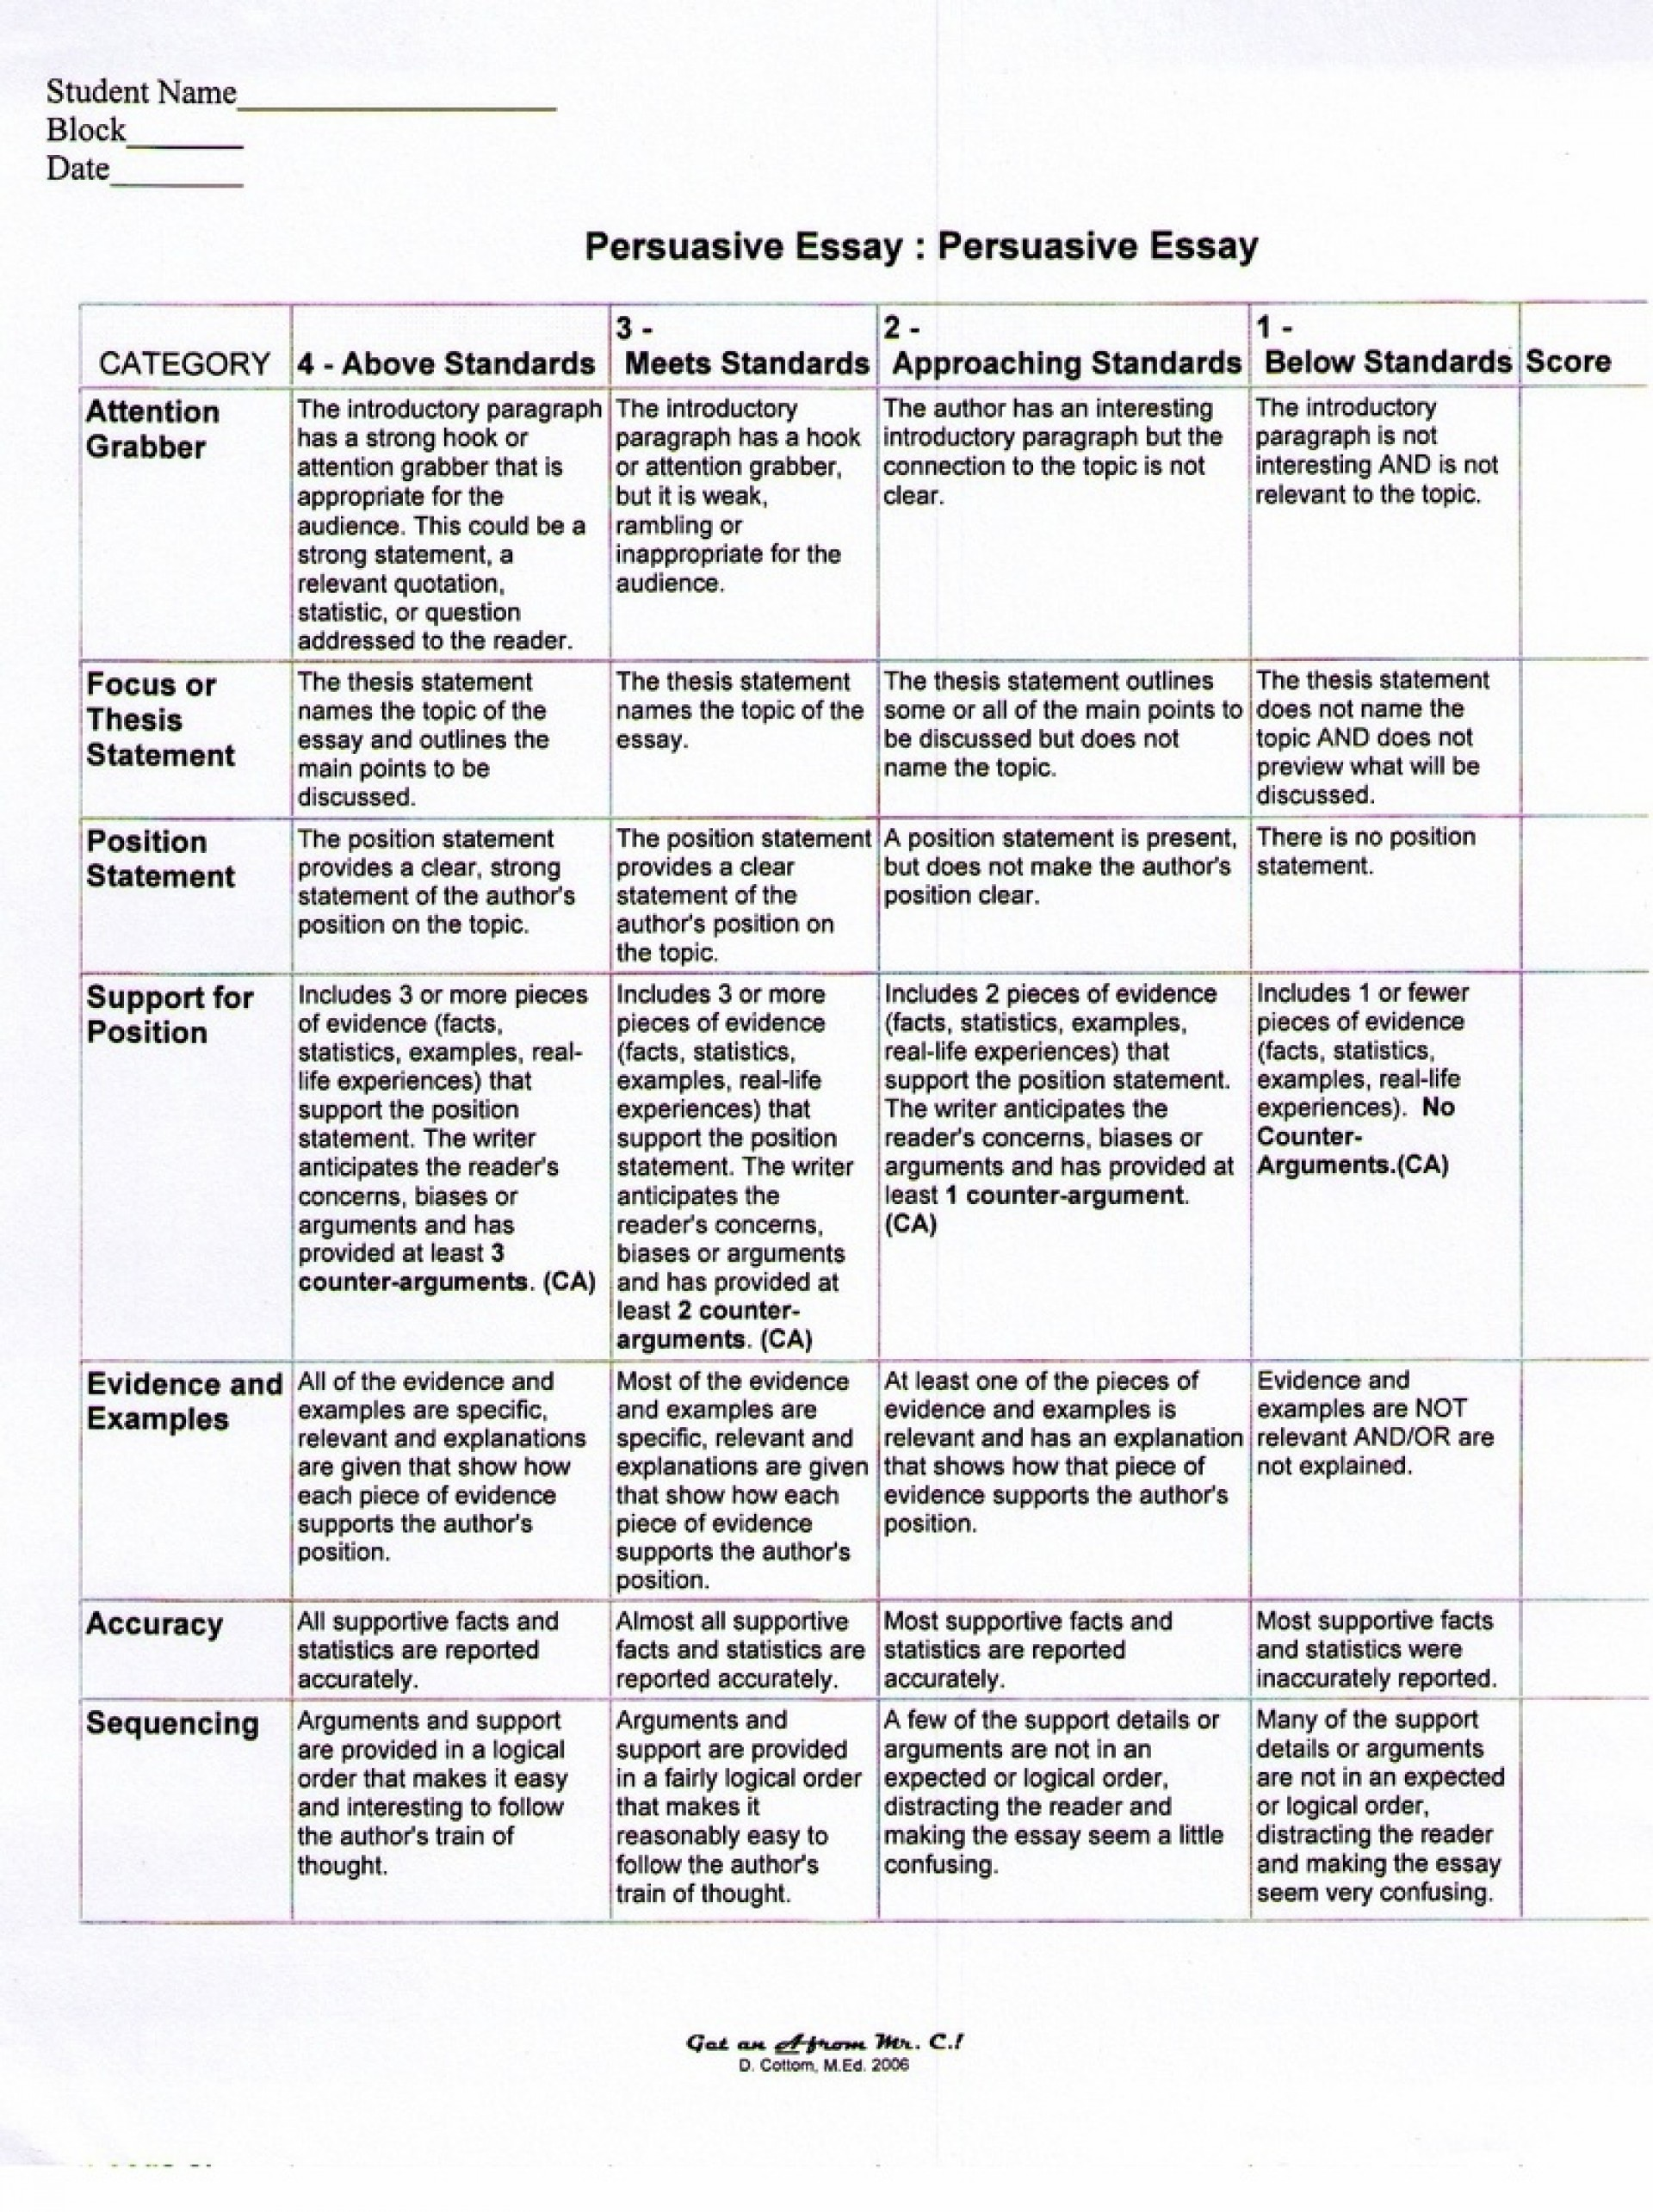 010 Persuasive Essay Rubric Example Stunning Argumentative Grade 10 8th Doc Middle School Pdf 1920